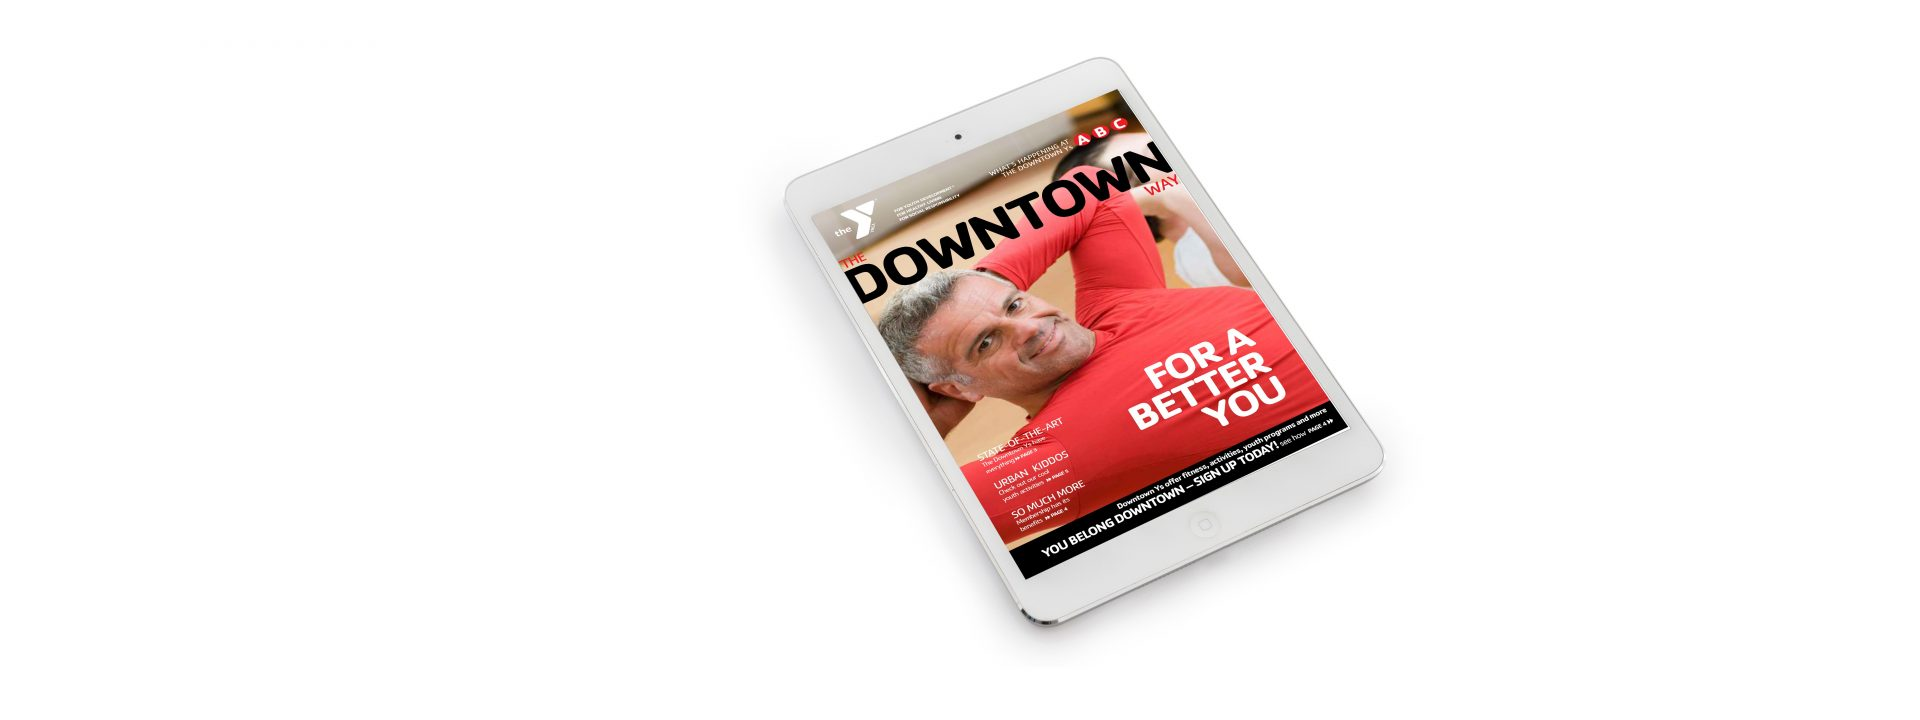 Digital Guides | whyMarlin | YMCA Marketing Experts